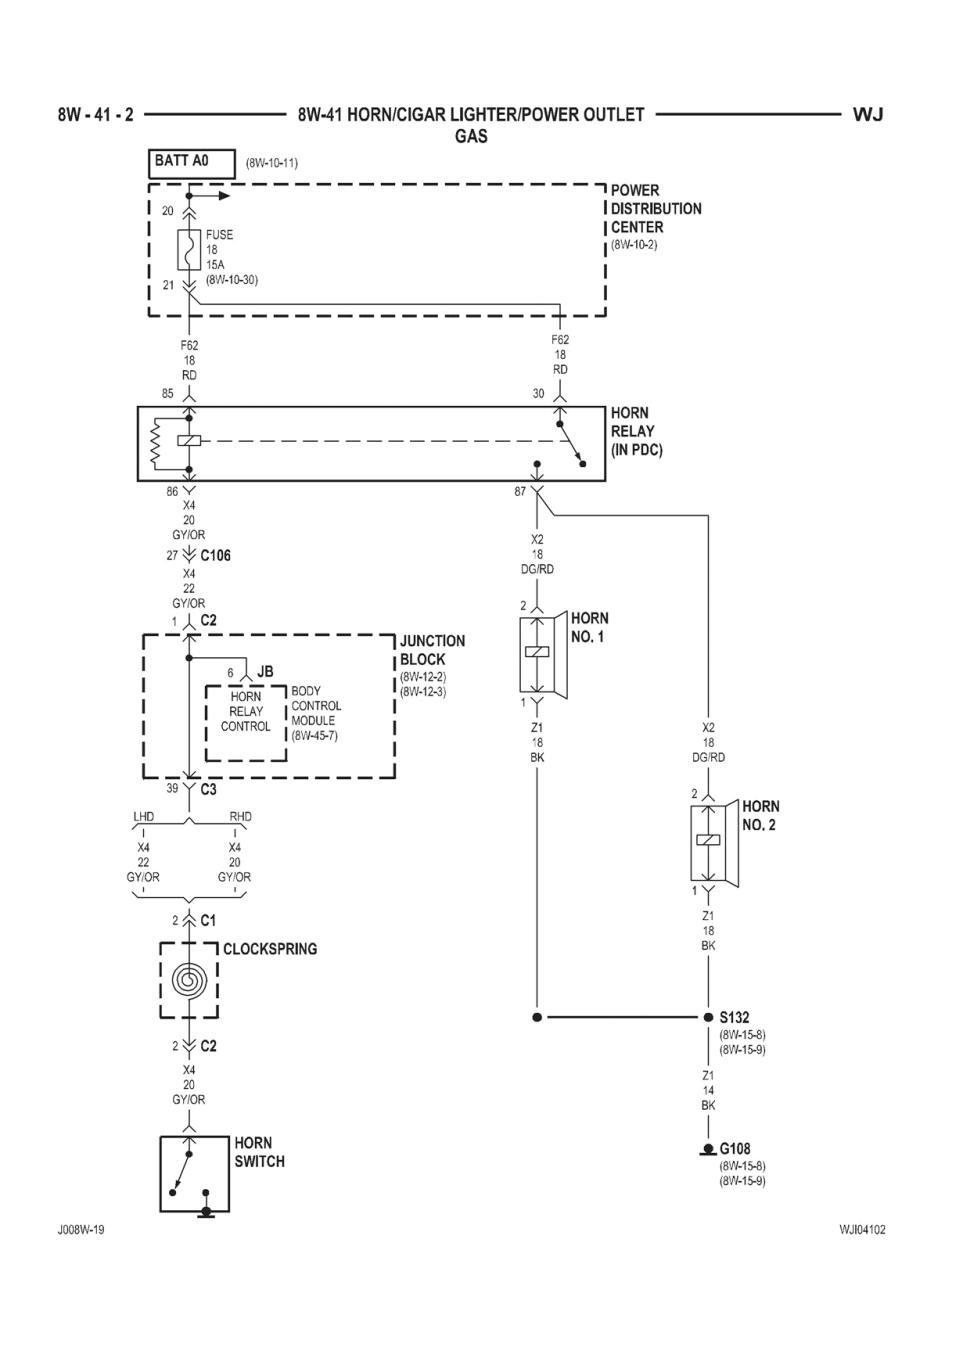 wj-horn-circuit.jpg